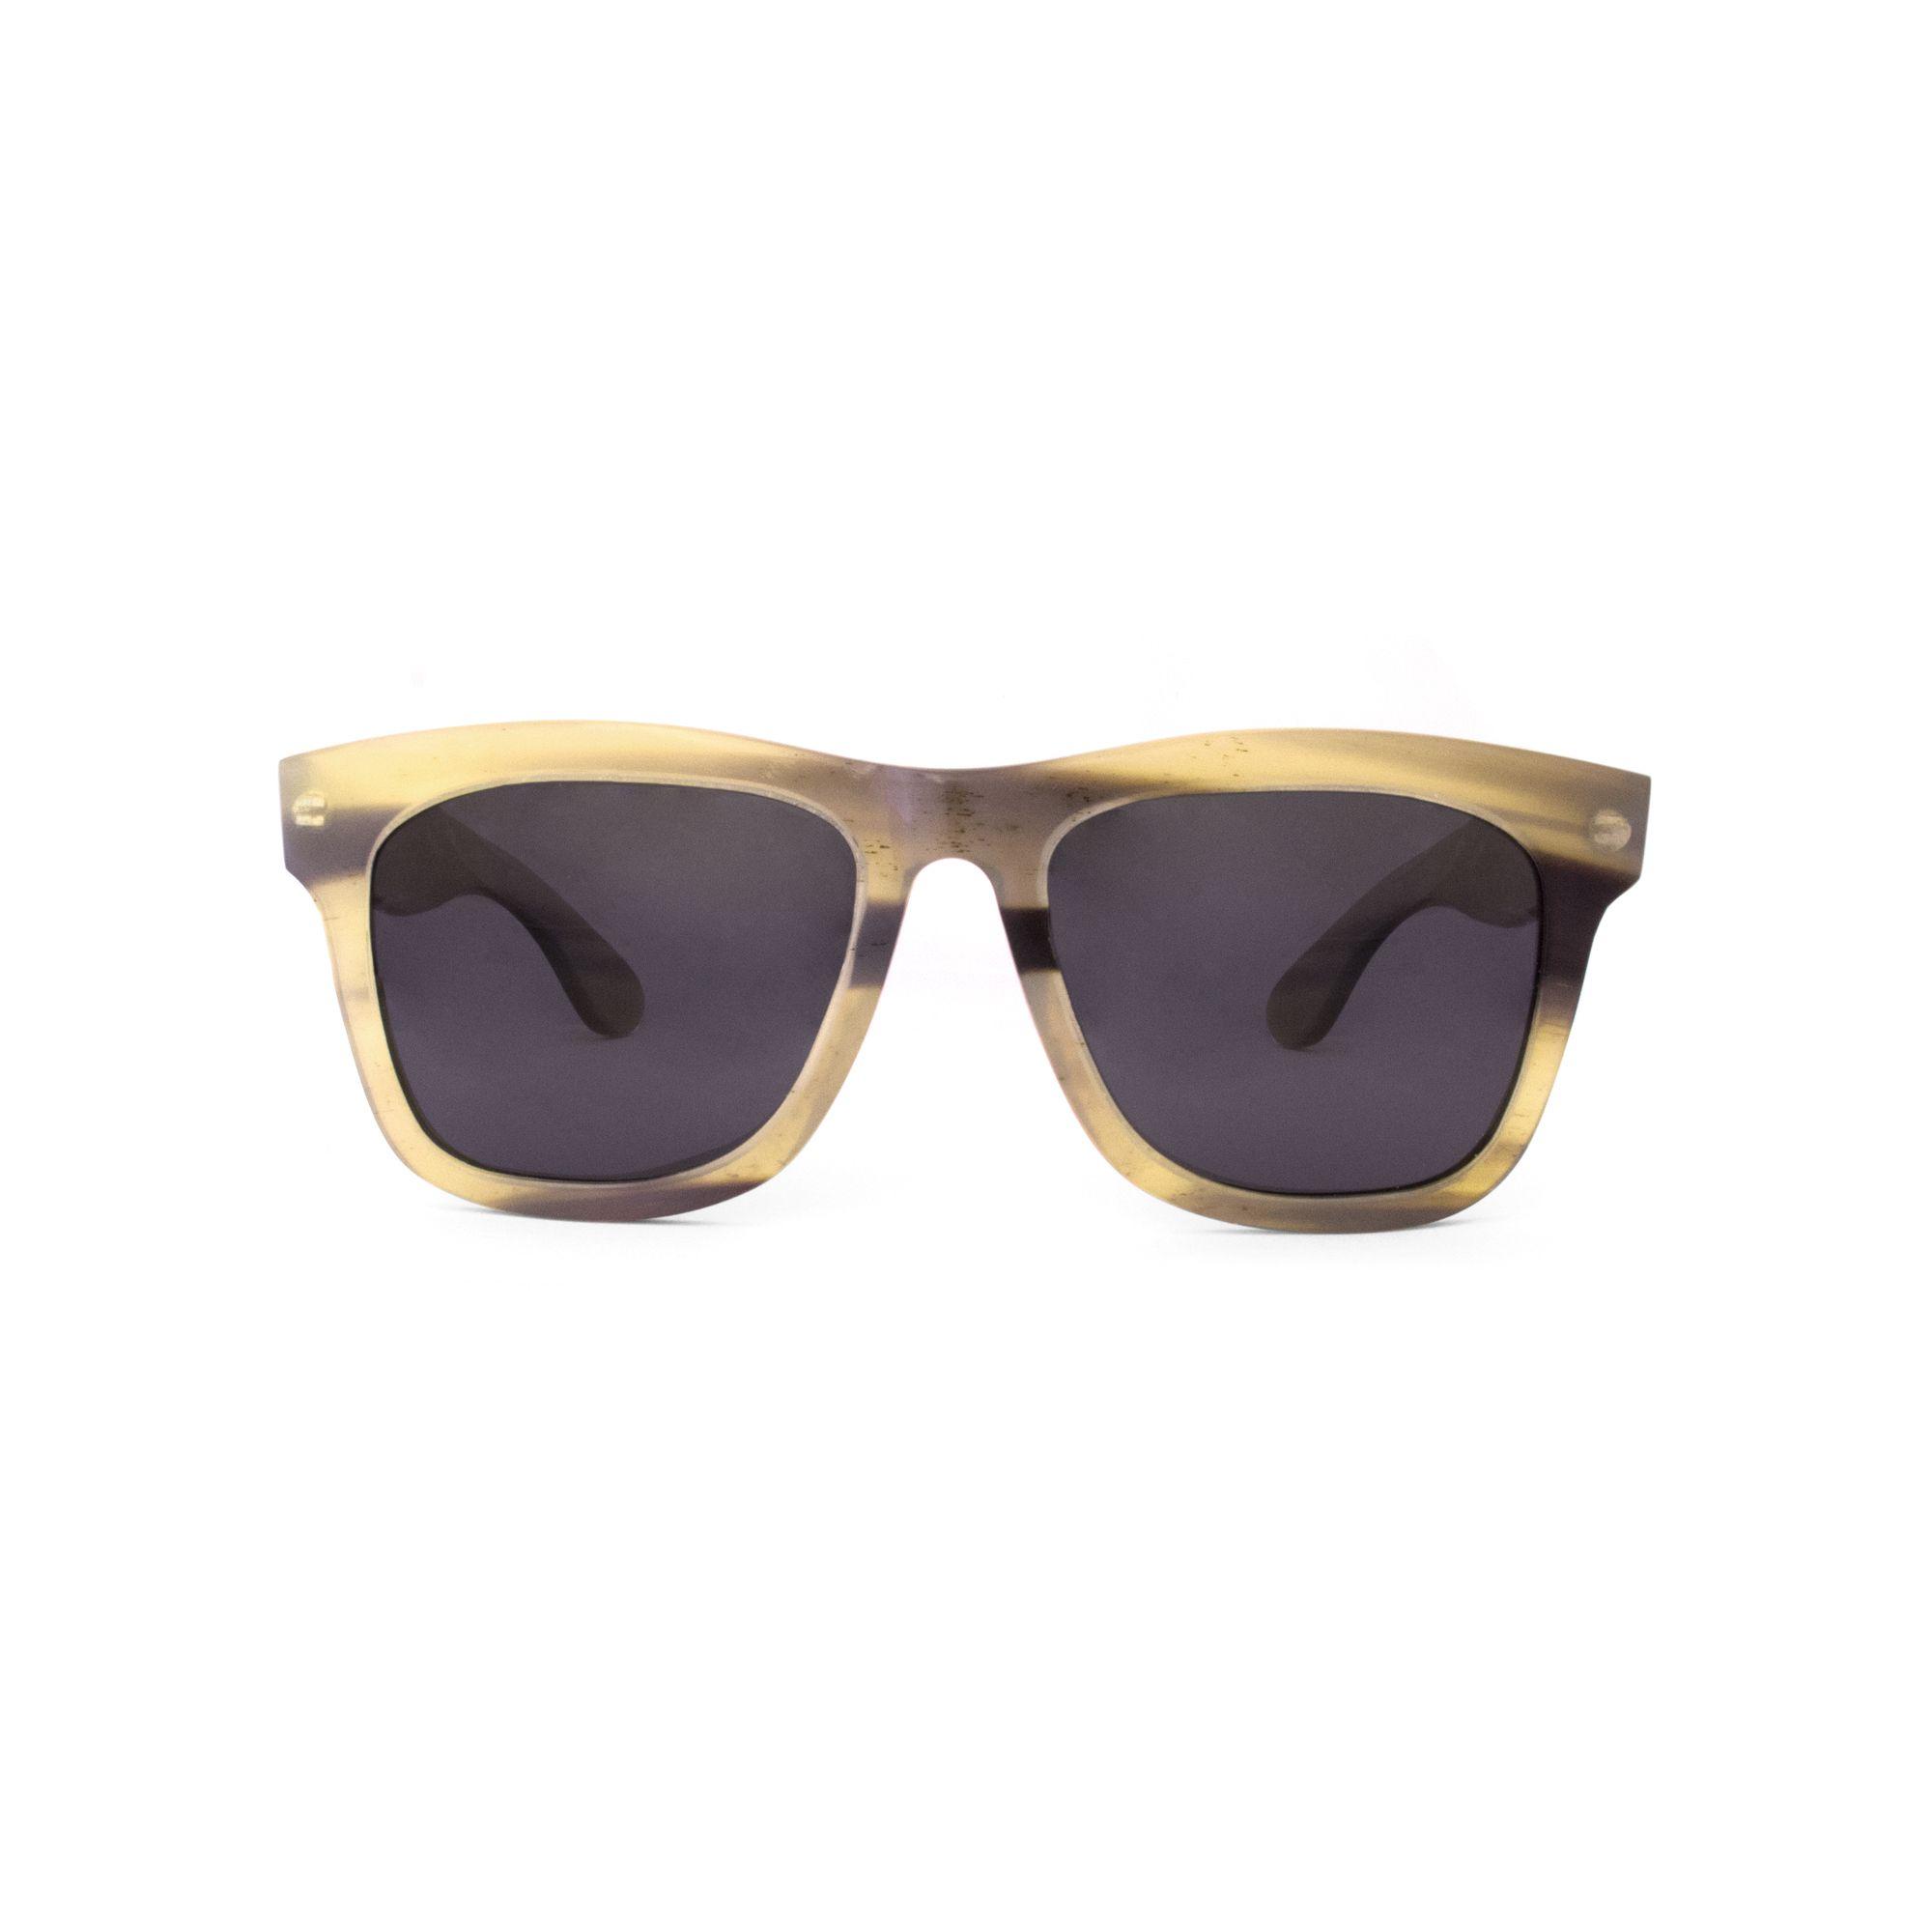 Doune Sun Sunglasses at www.olliverabbott.com